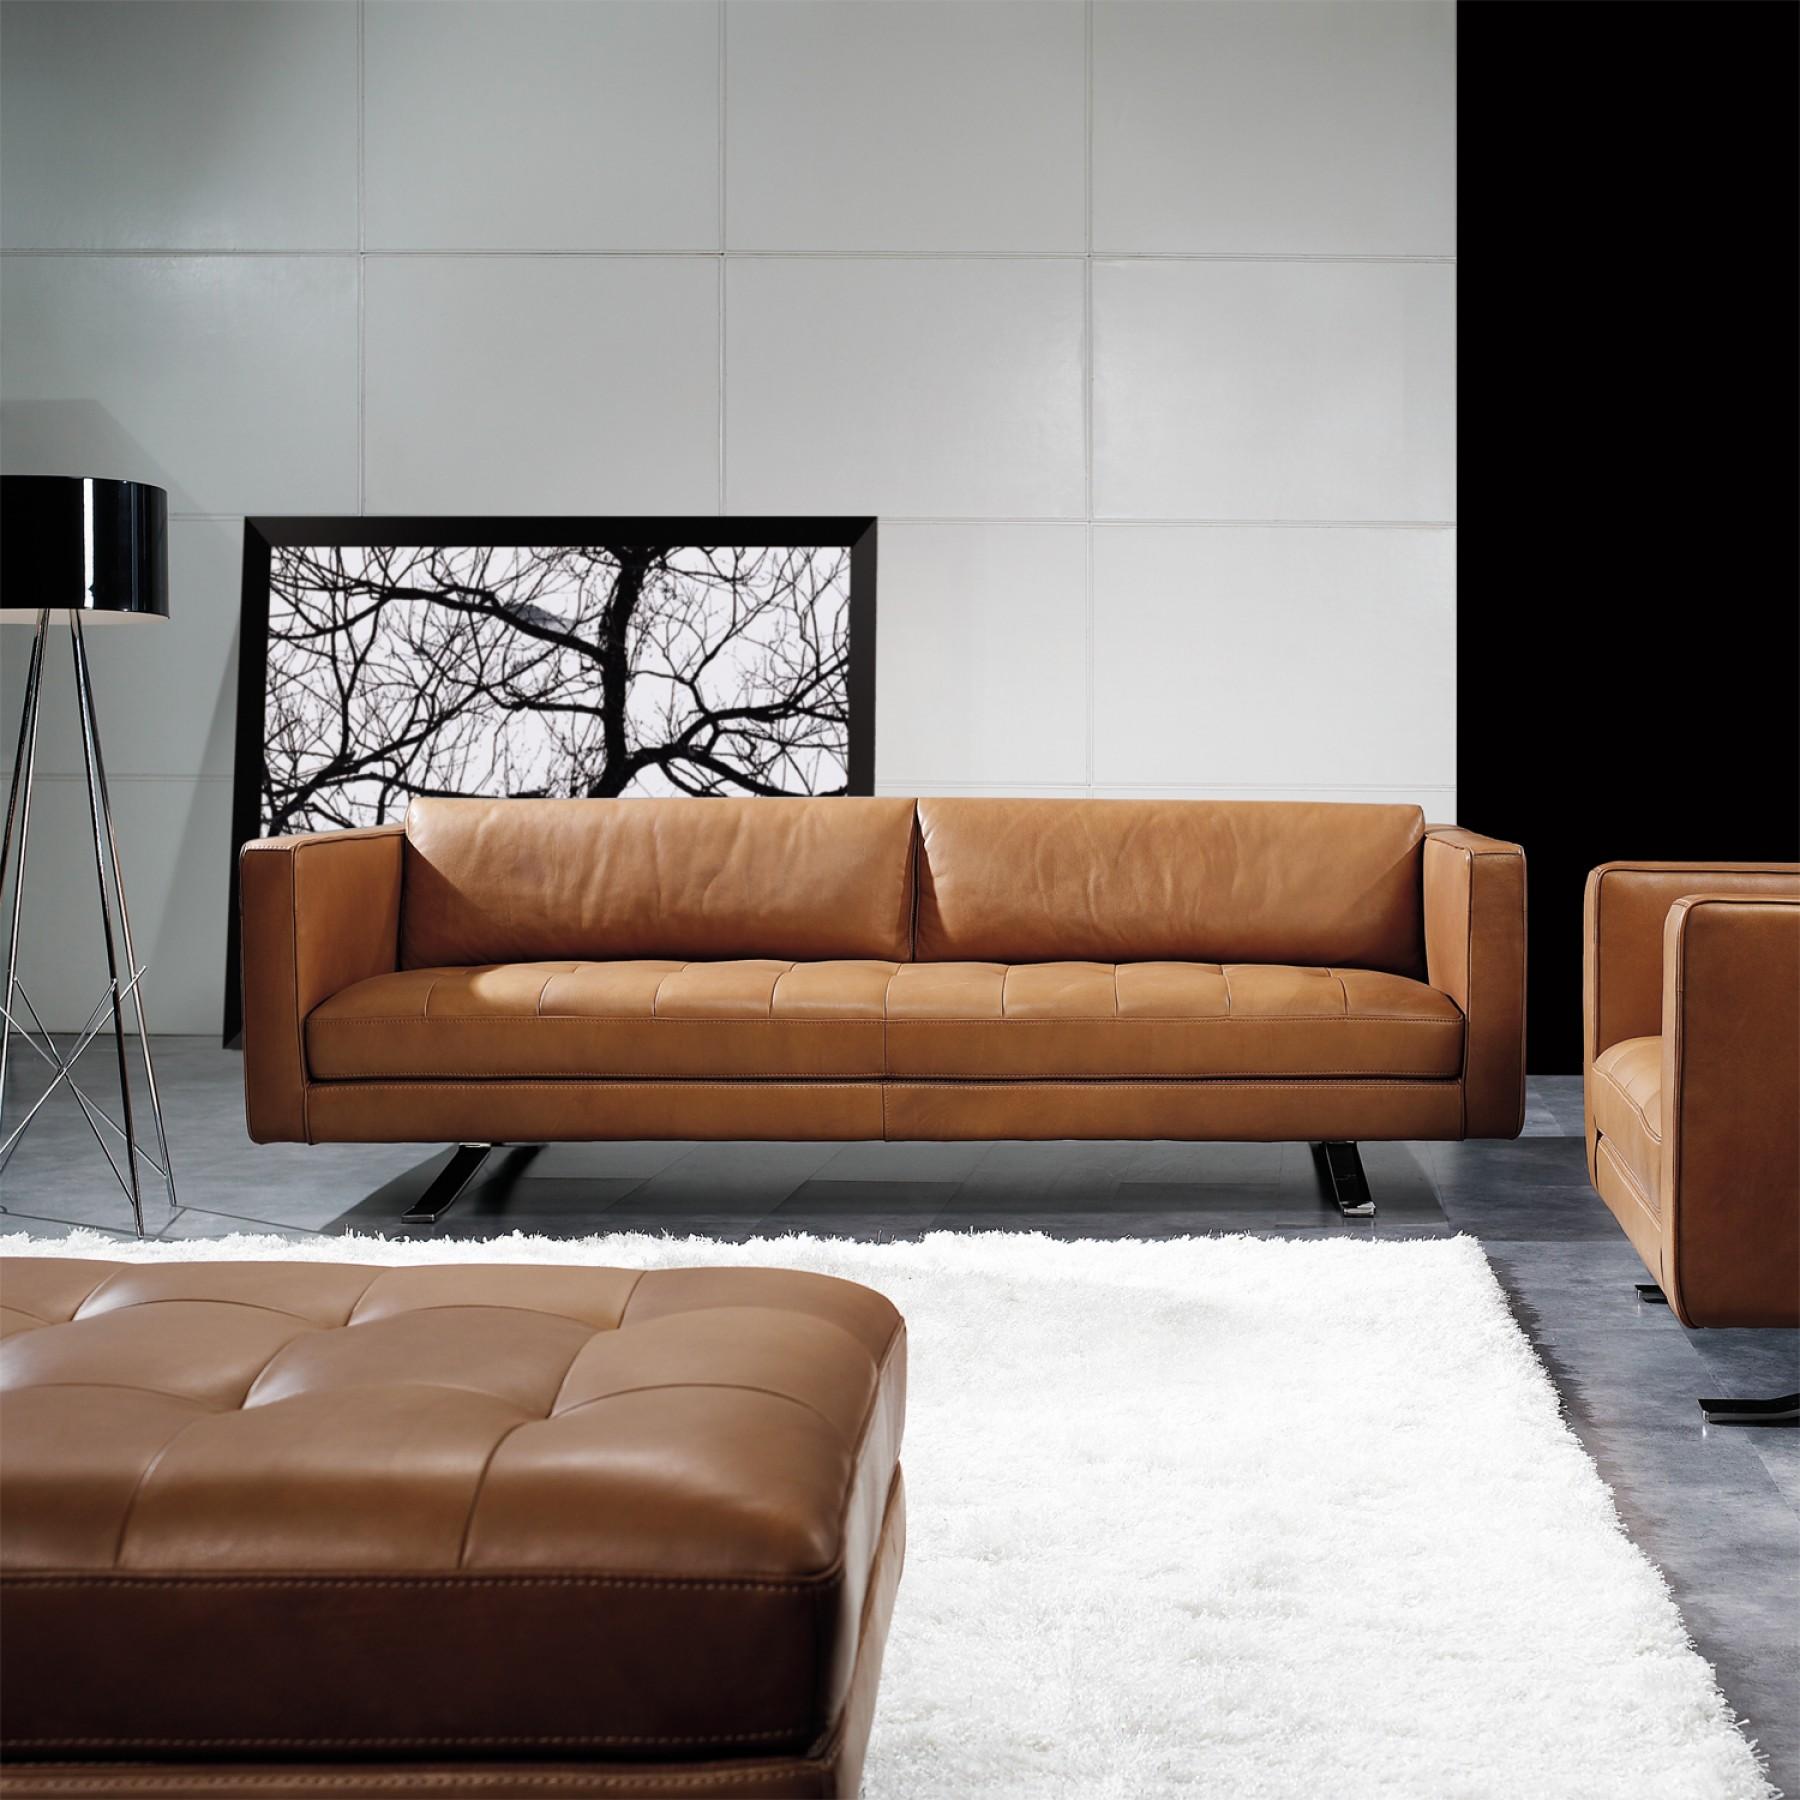 SORANO 3 SEATER SOFA - Beyond Furniture